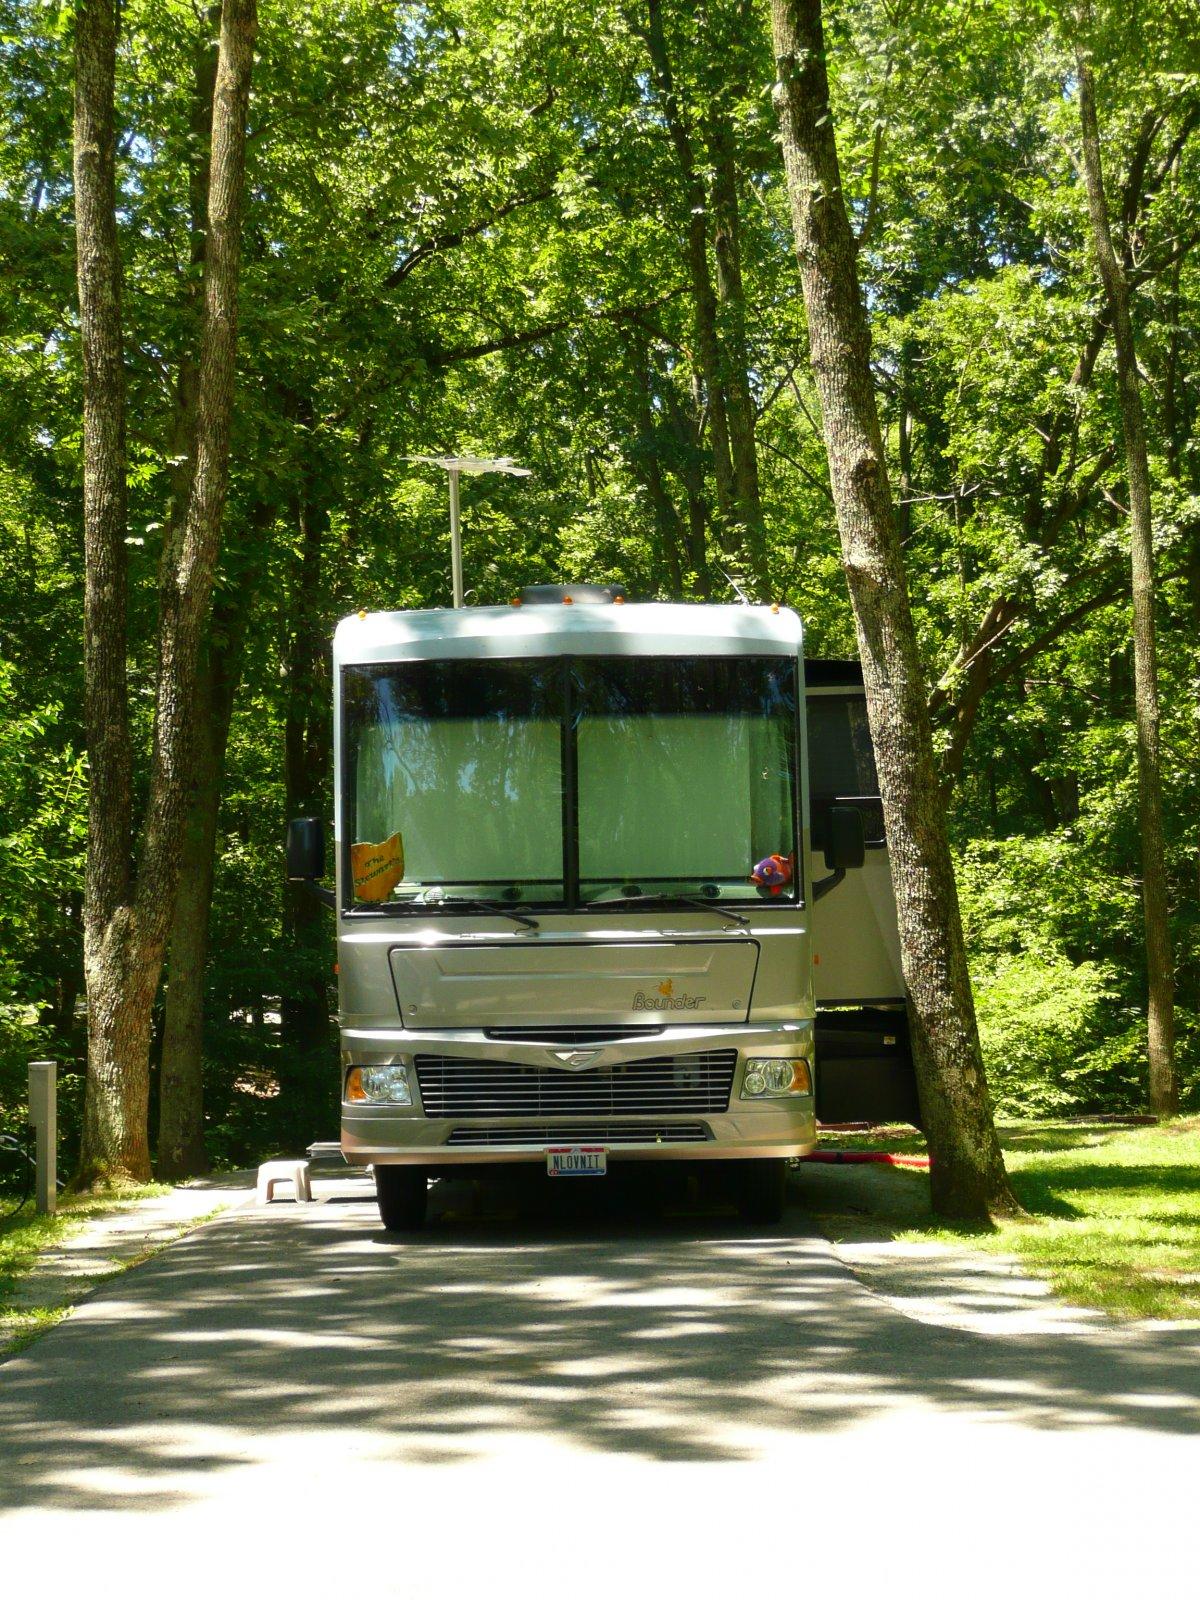 Click image for larger version  Name:General Butler Resort State Park 008.jpg Views:47 Size:585.2 KB ID:7969